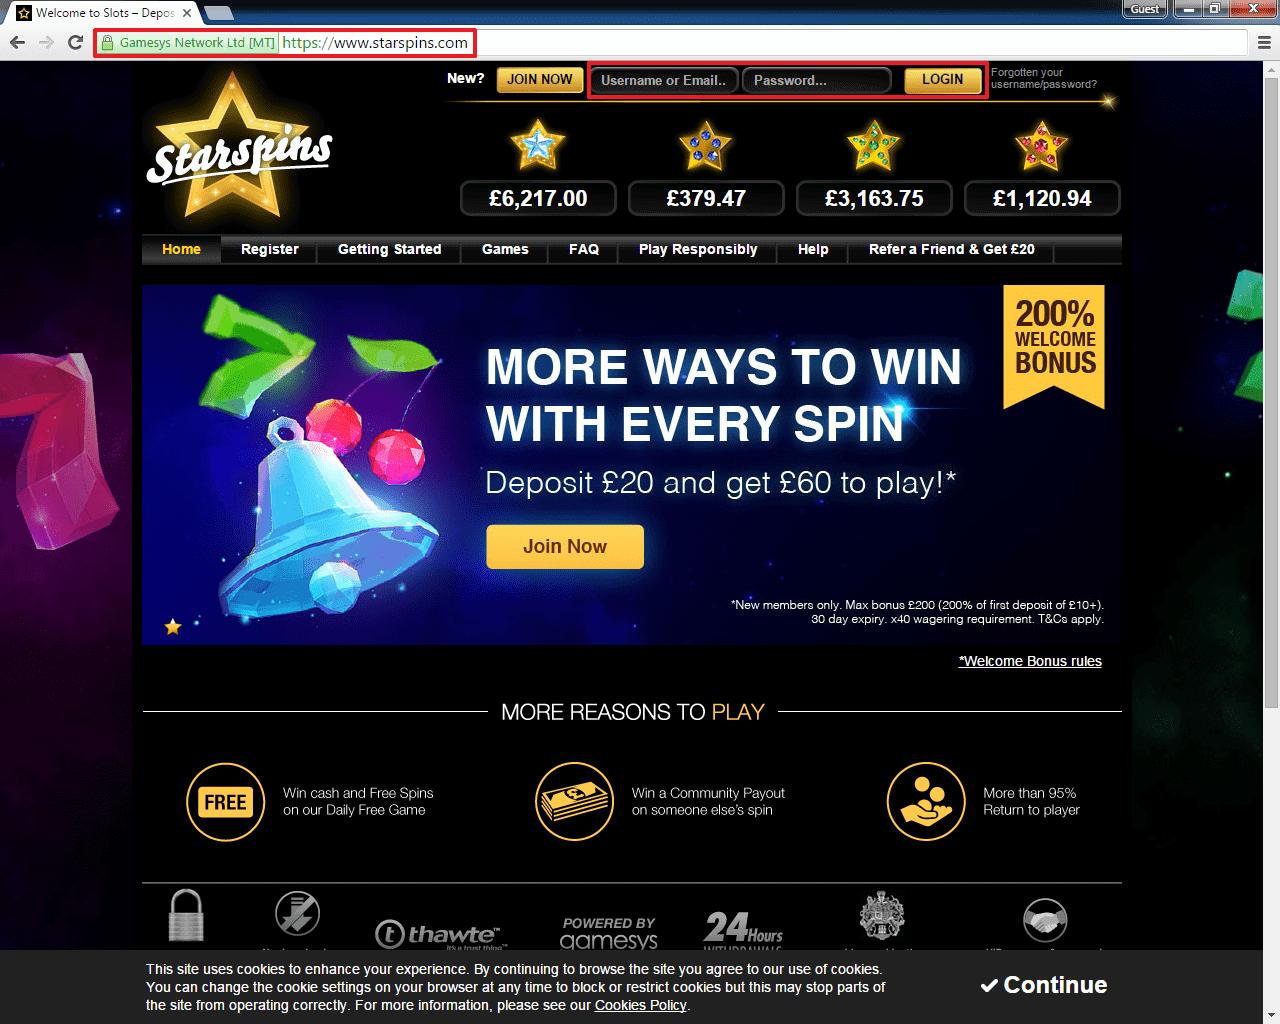 Casino Rewards 61599